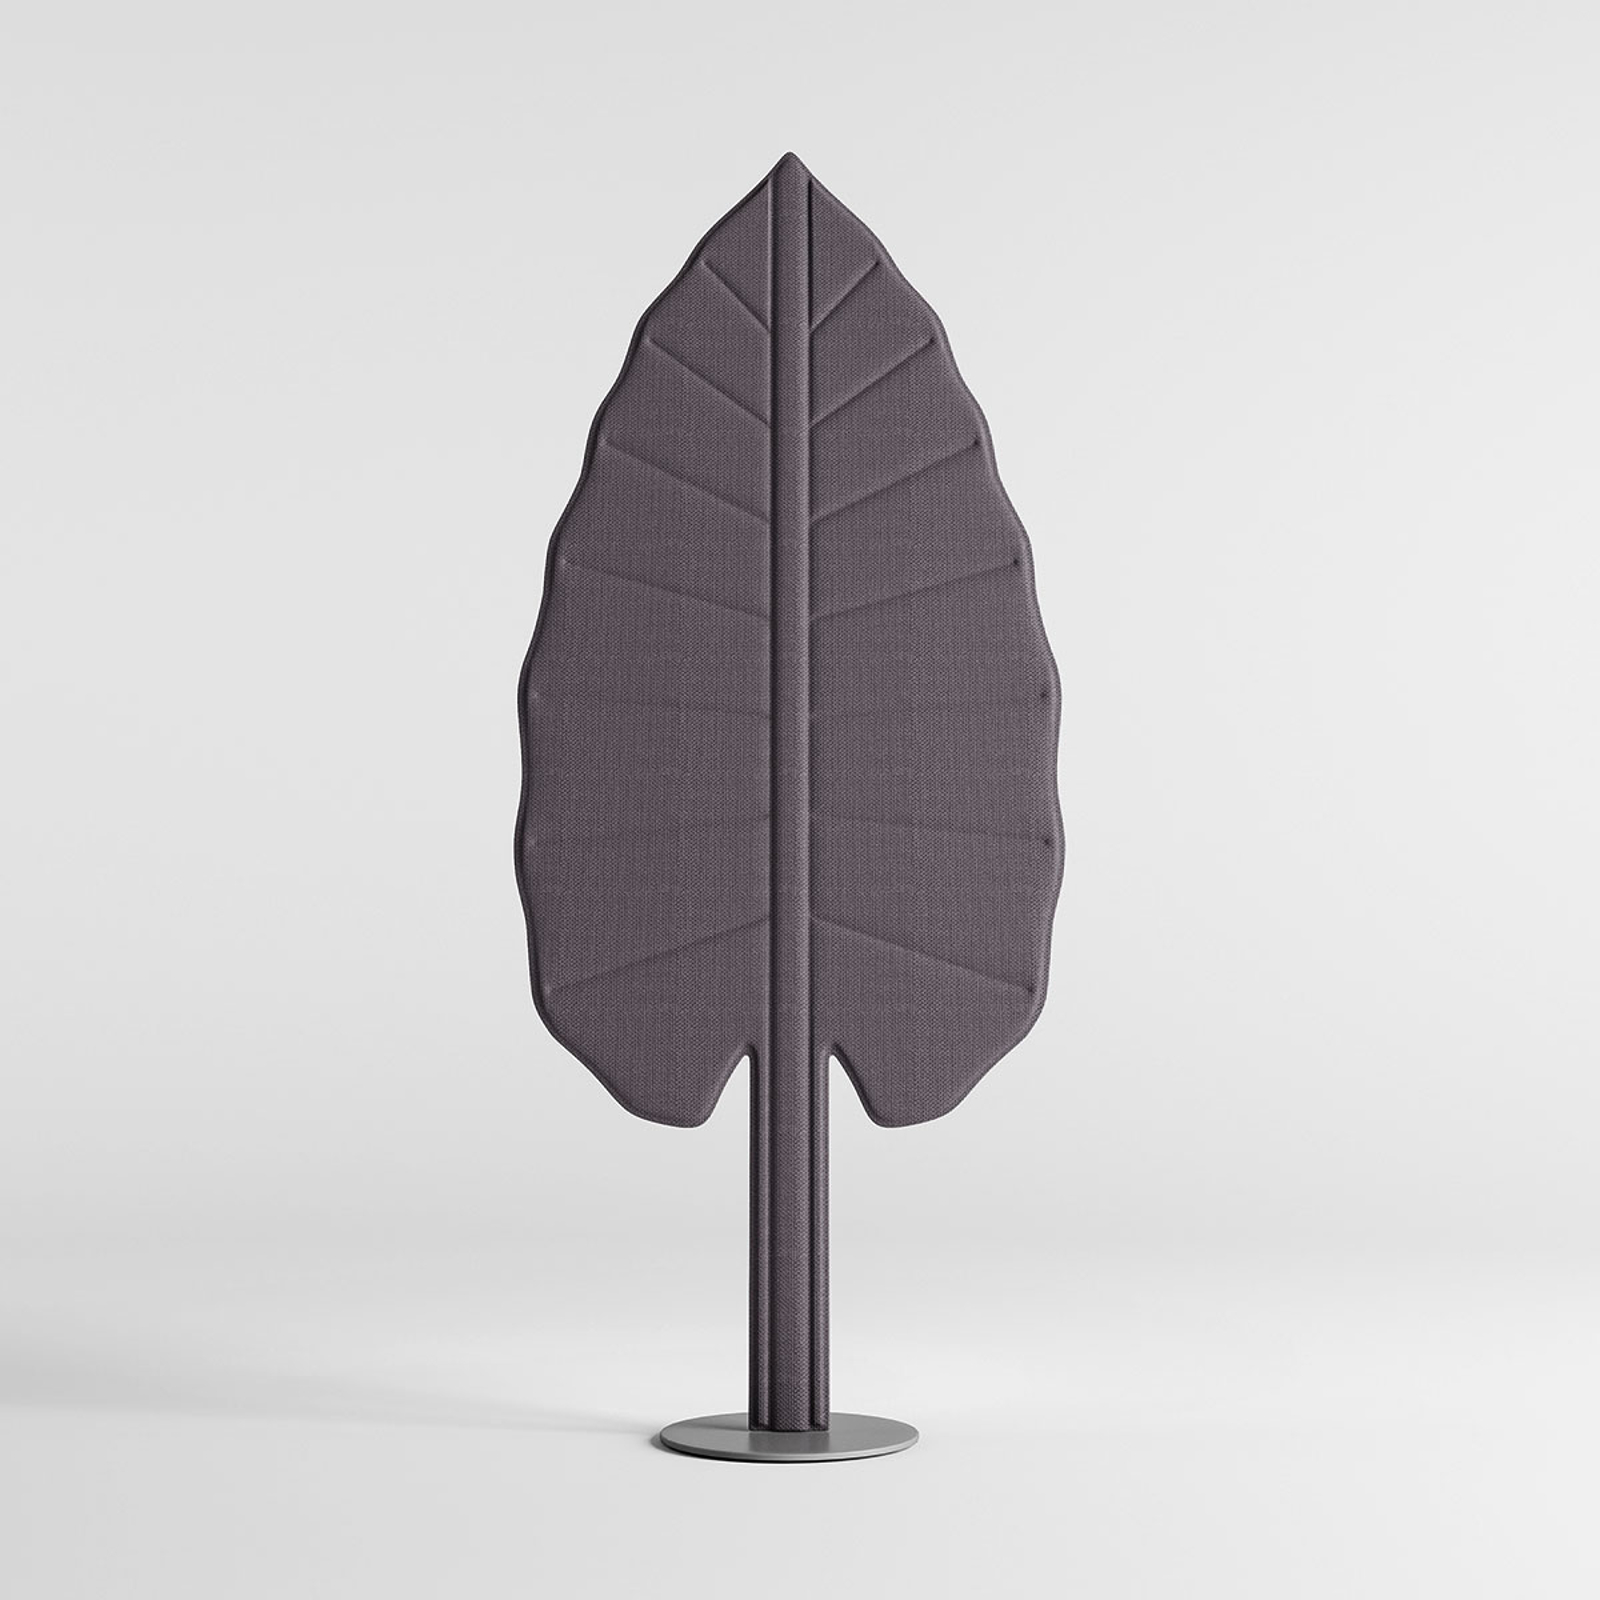 Rotaliana Eden Alocasia LED-Stehleuchte, grau